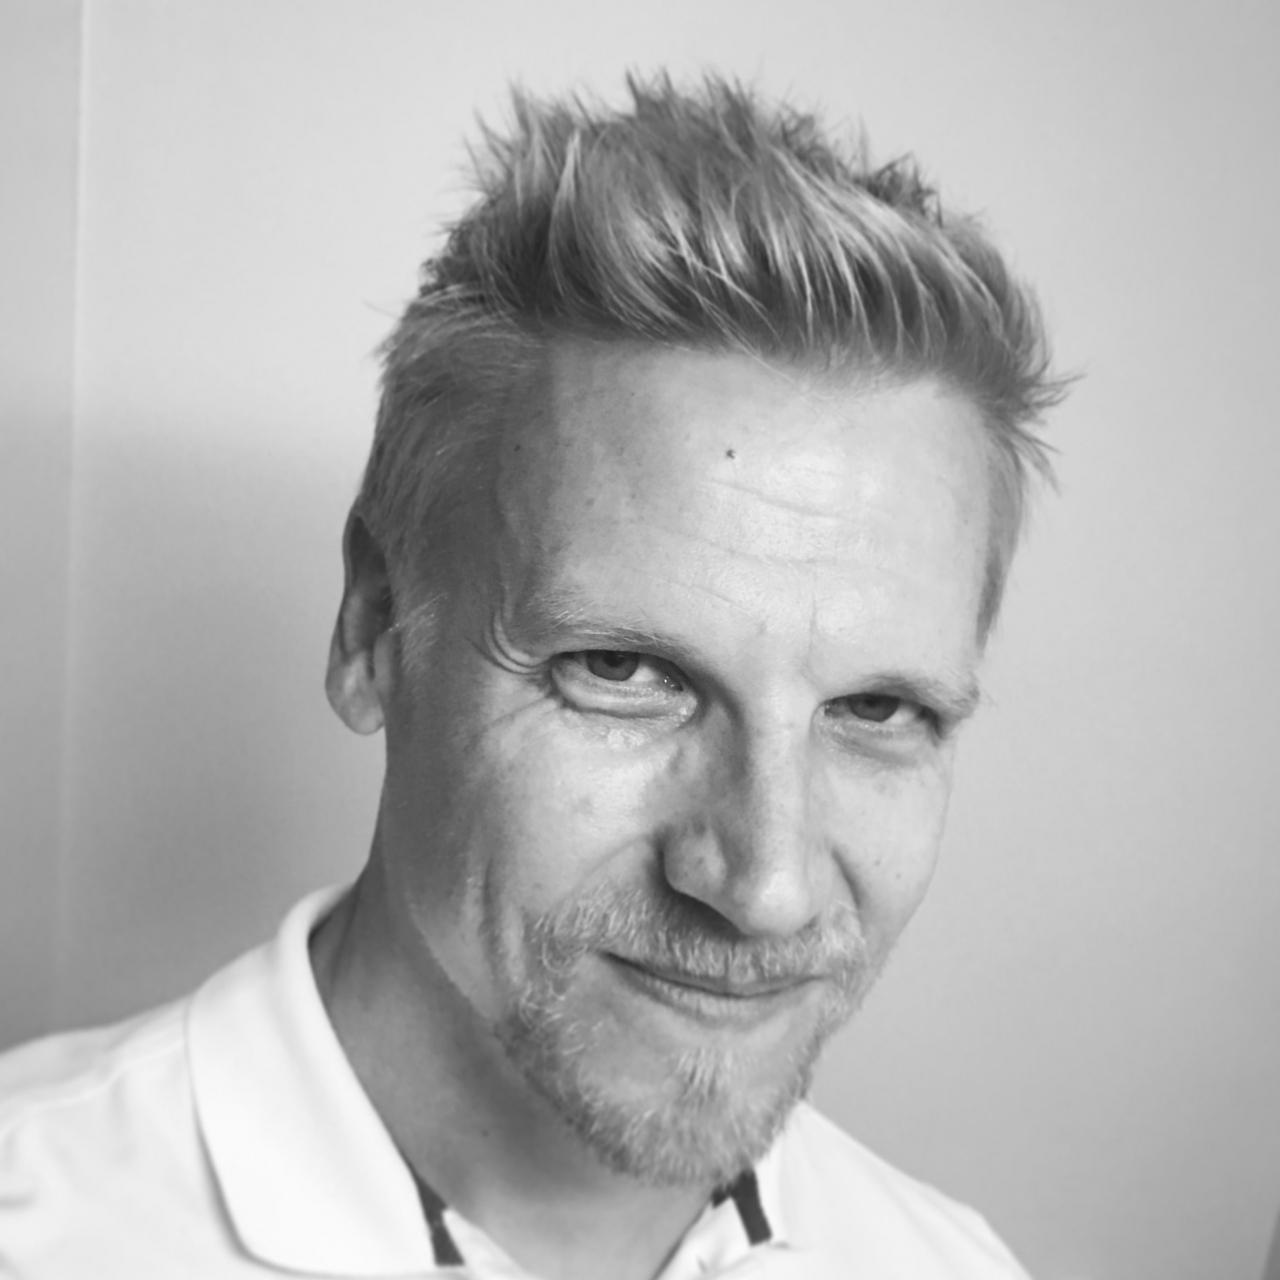 Pekka Ruotsalainen, Senior Program Manager, Microsoft